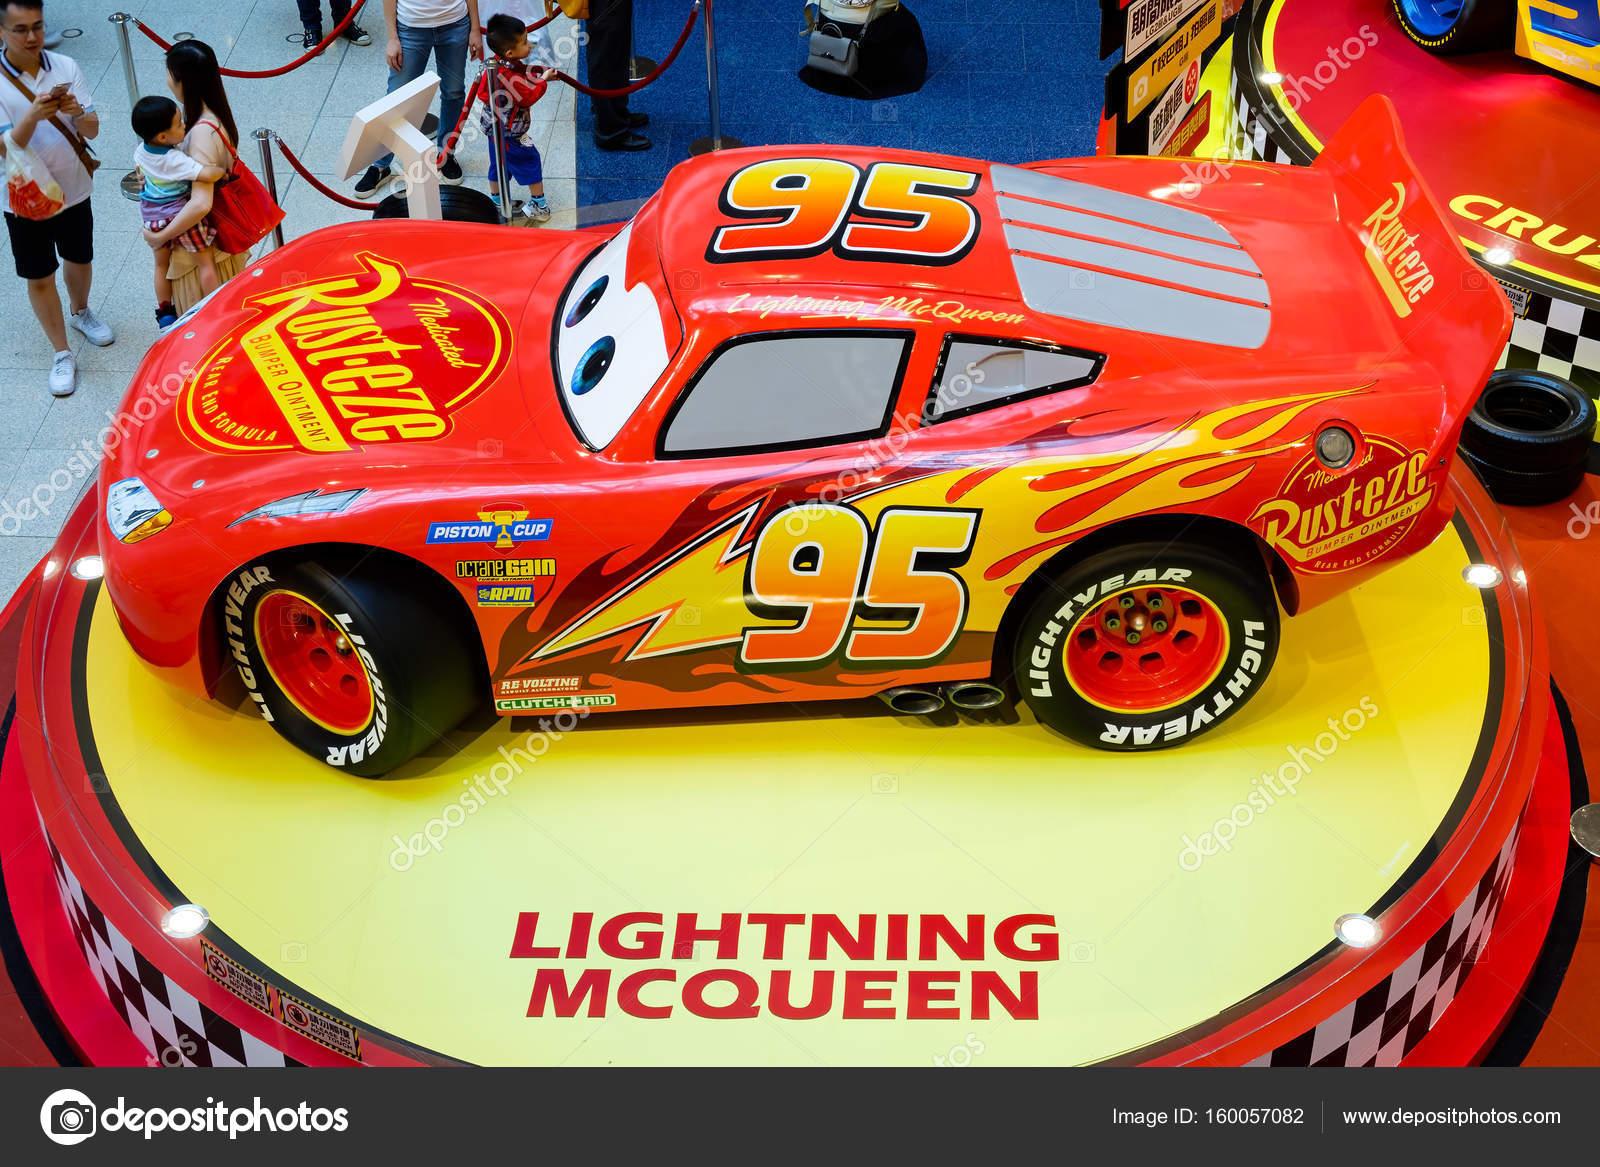 Disney Pixar Feature Film Cars 3 Racing Mania Displays The Event At